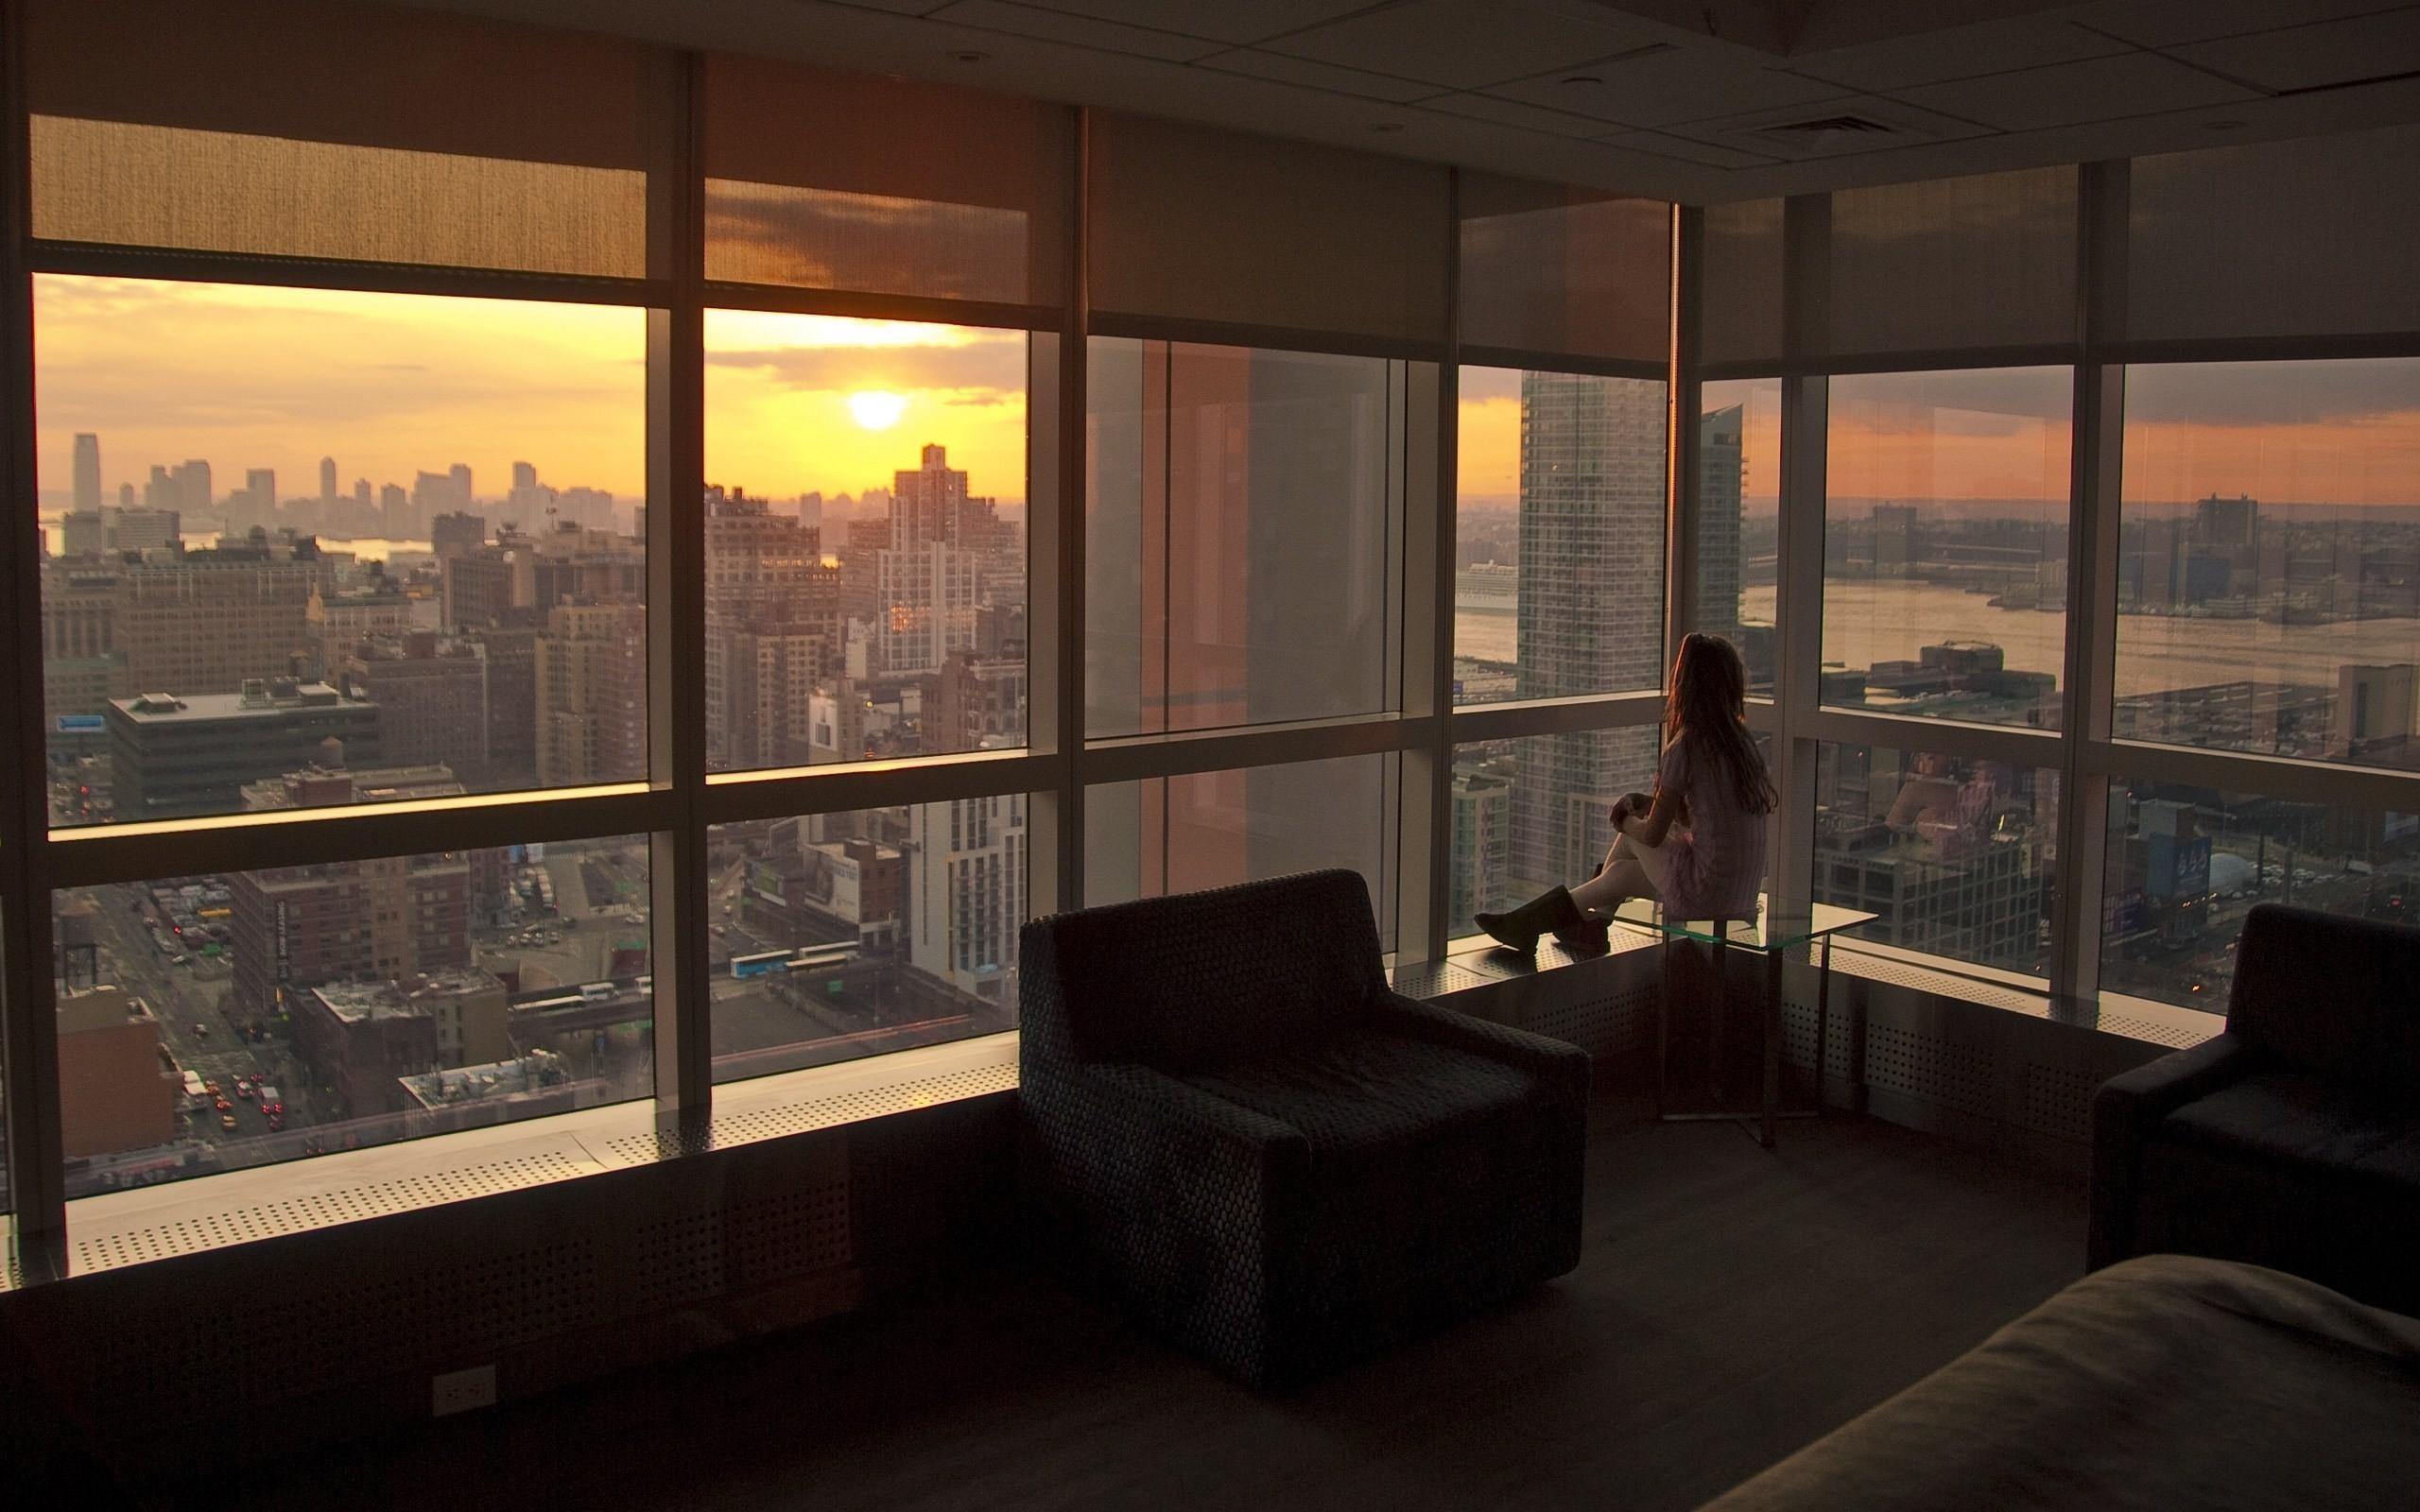 Hintergrundbilder : Frau, Modell-, Fenster, Stadt, Stadtbild, Zimmer ...